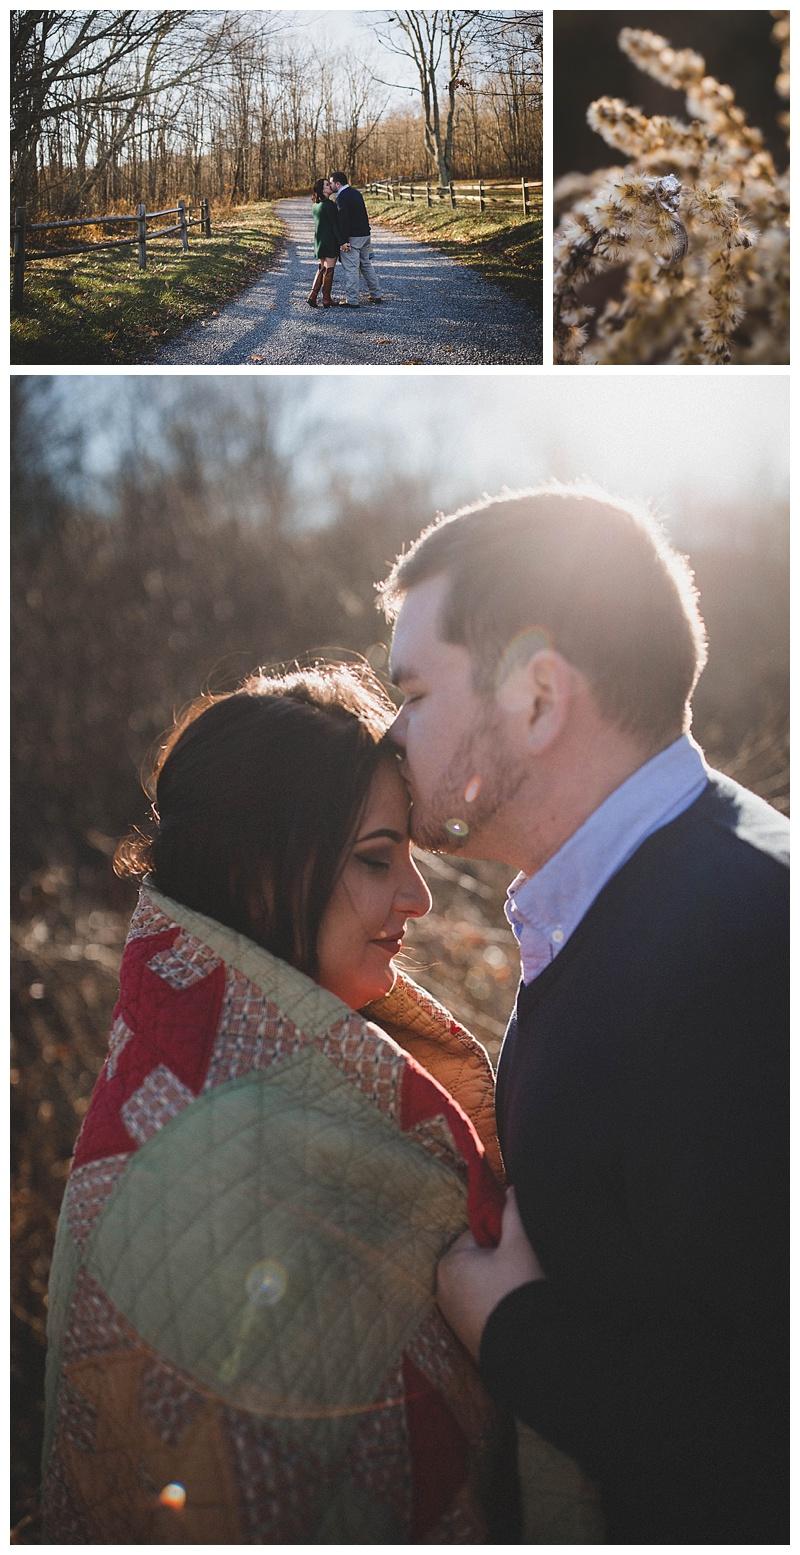 EmilyRogers_southwest-va-wedding-photographer-lebanon-virginia-senior-photographer_0022.jpg